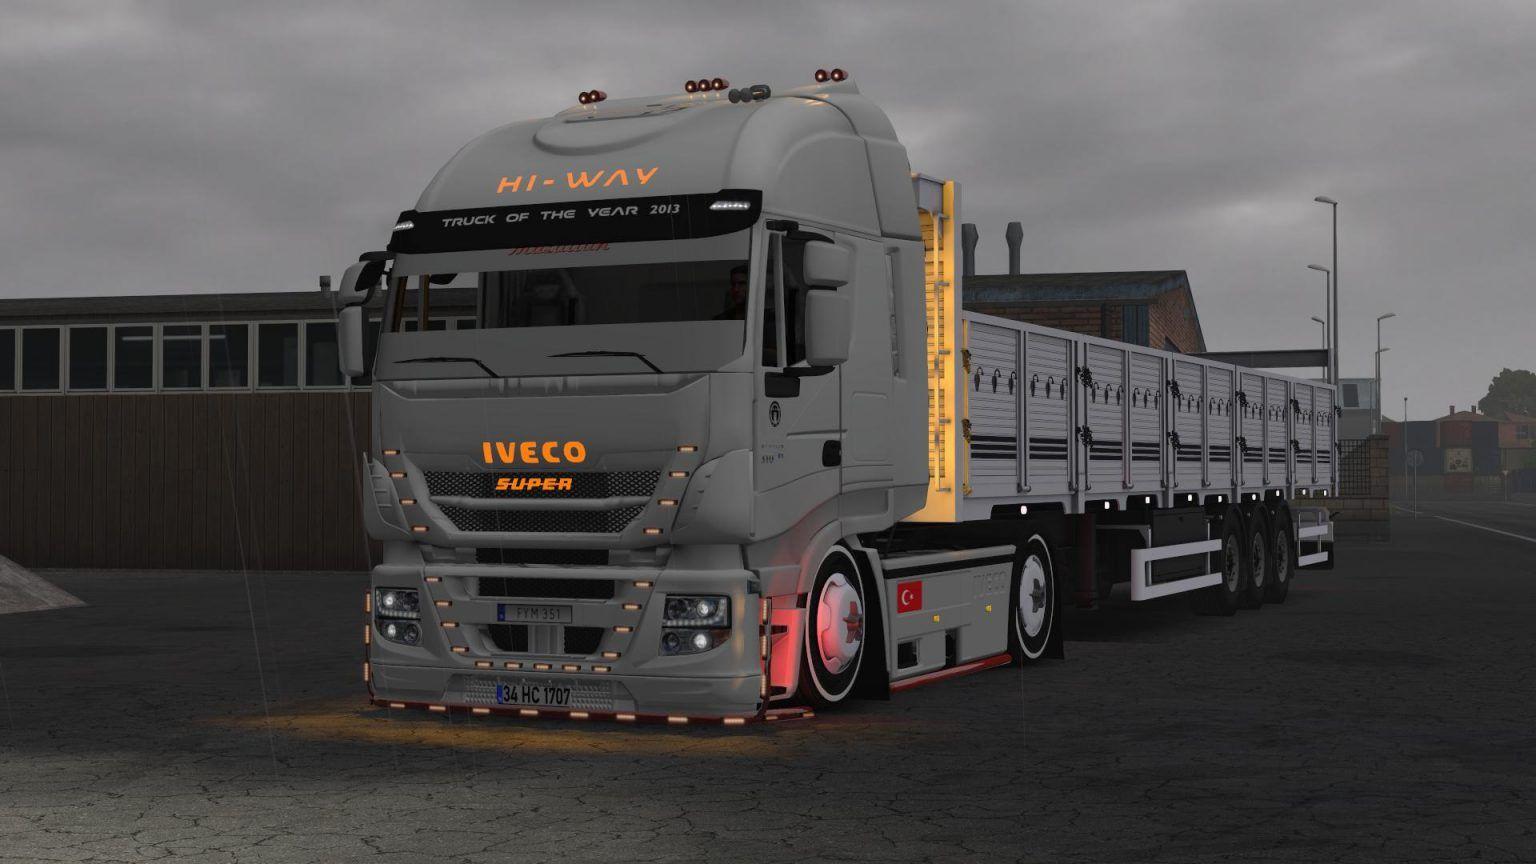 Iveco Hi Way Custom 1 37 Ets 2 Trucks Ets 2 Mods Custom